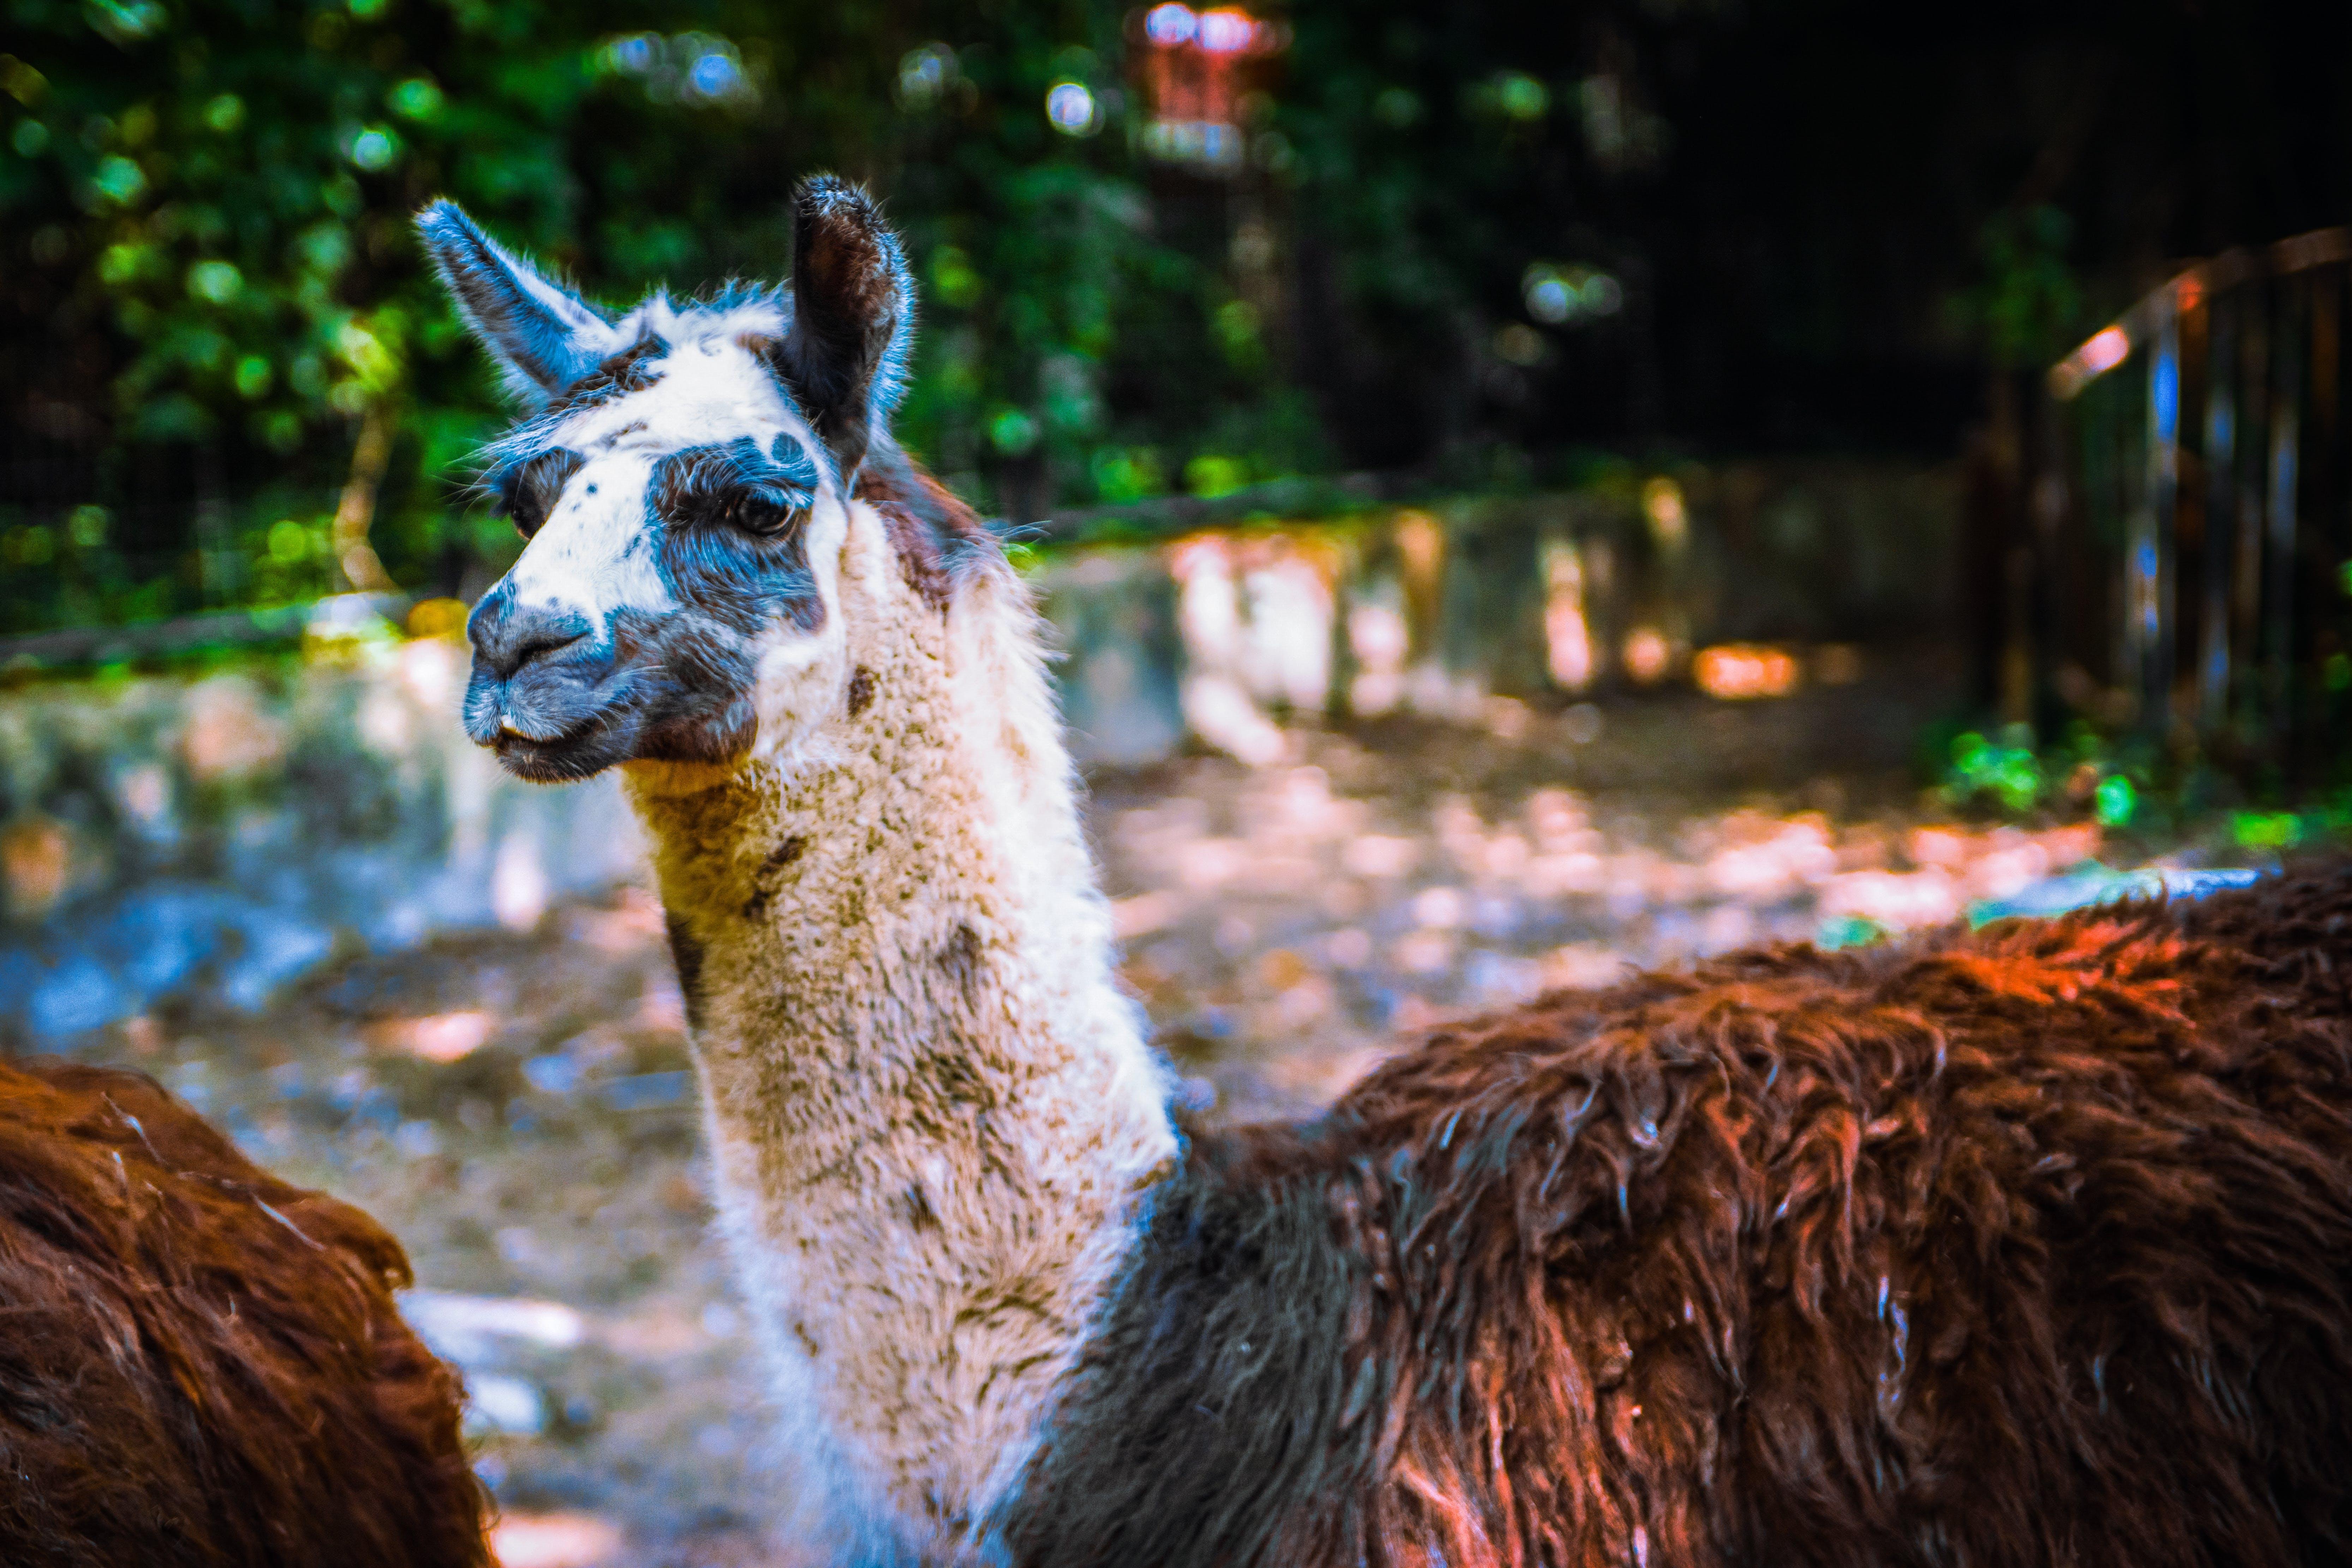 Free stock photo of adorable animal, alpaca, Alpacos, animal